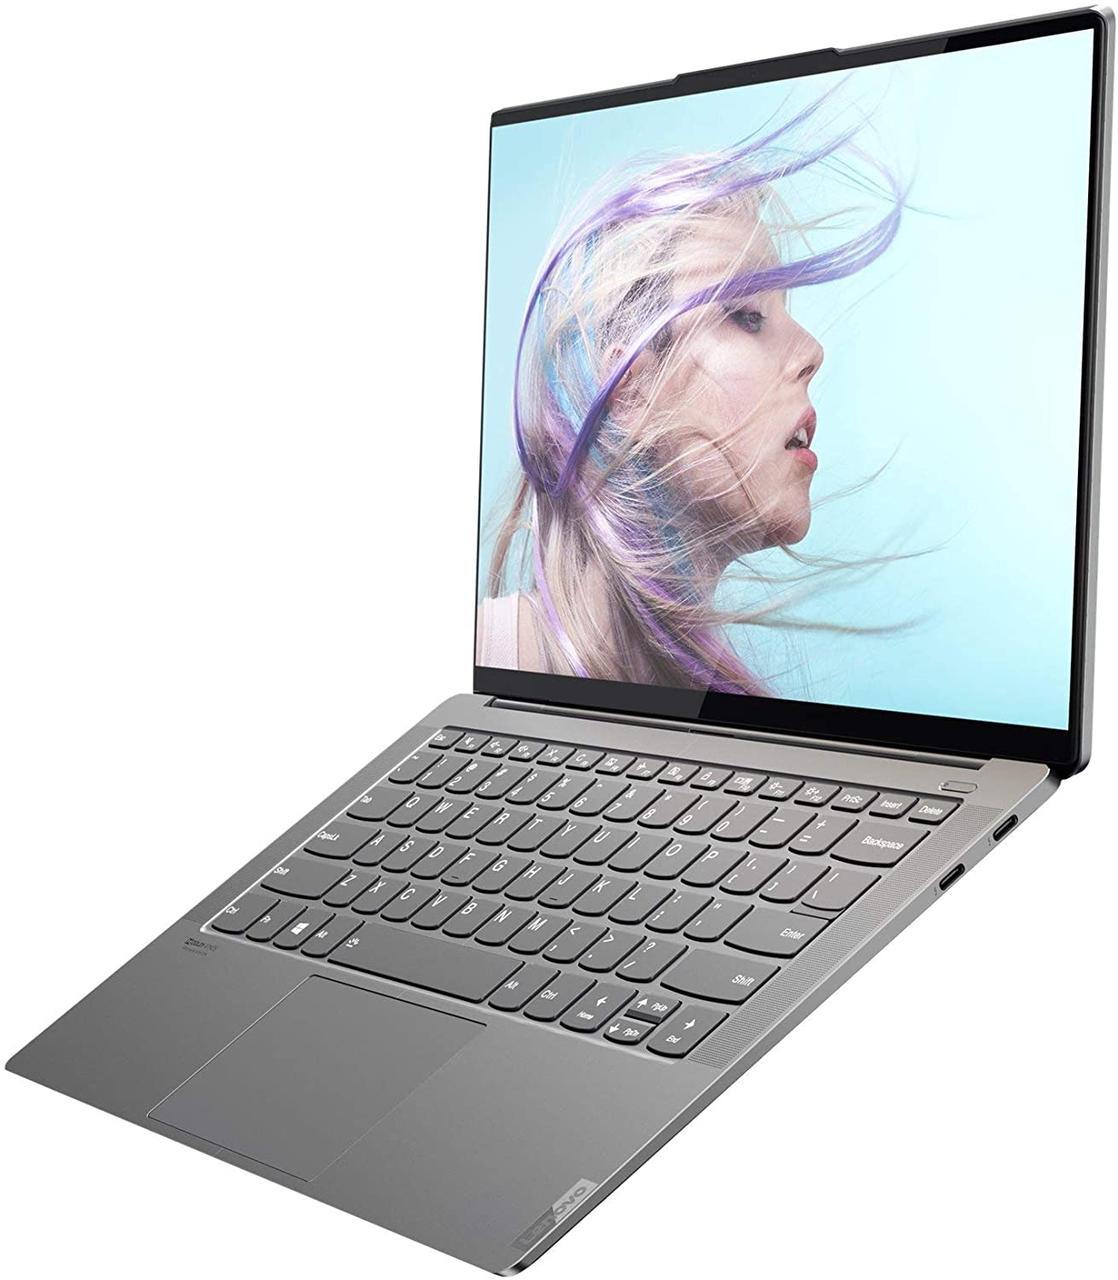 Lenovo IdeaPad S940-14IWL (81R00004US)